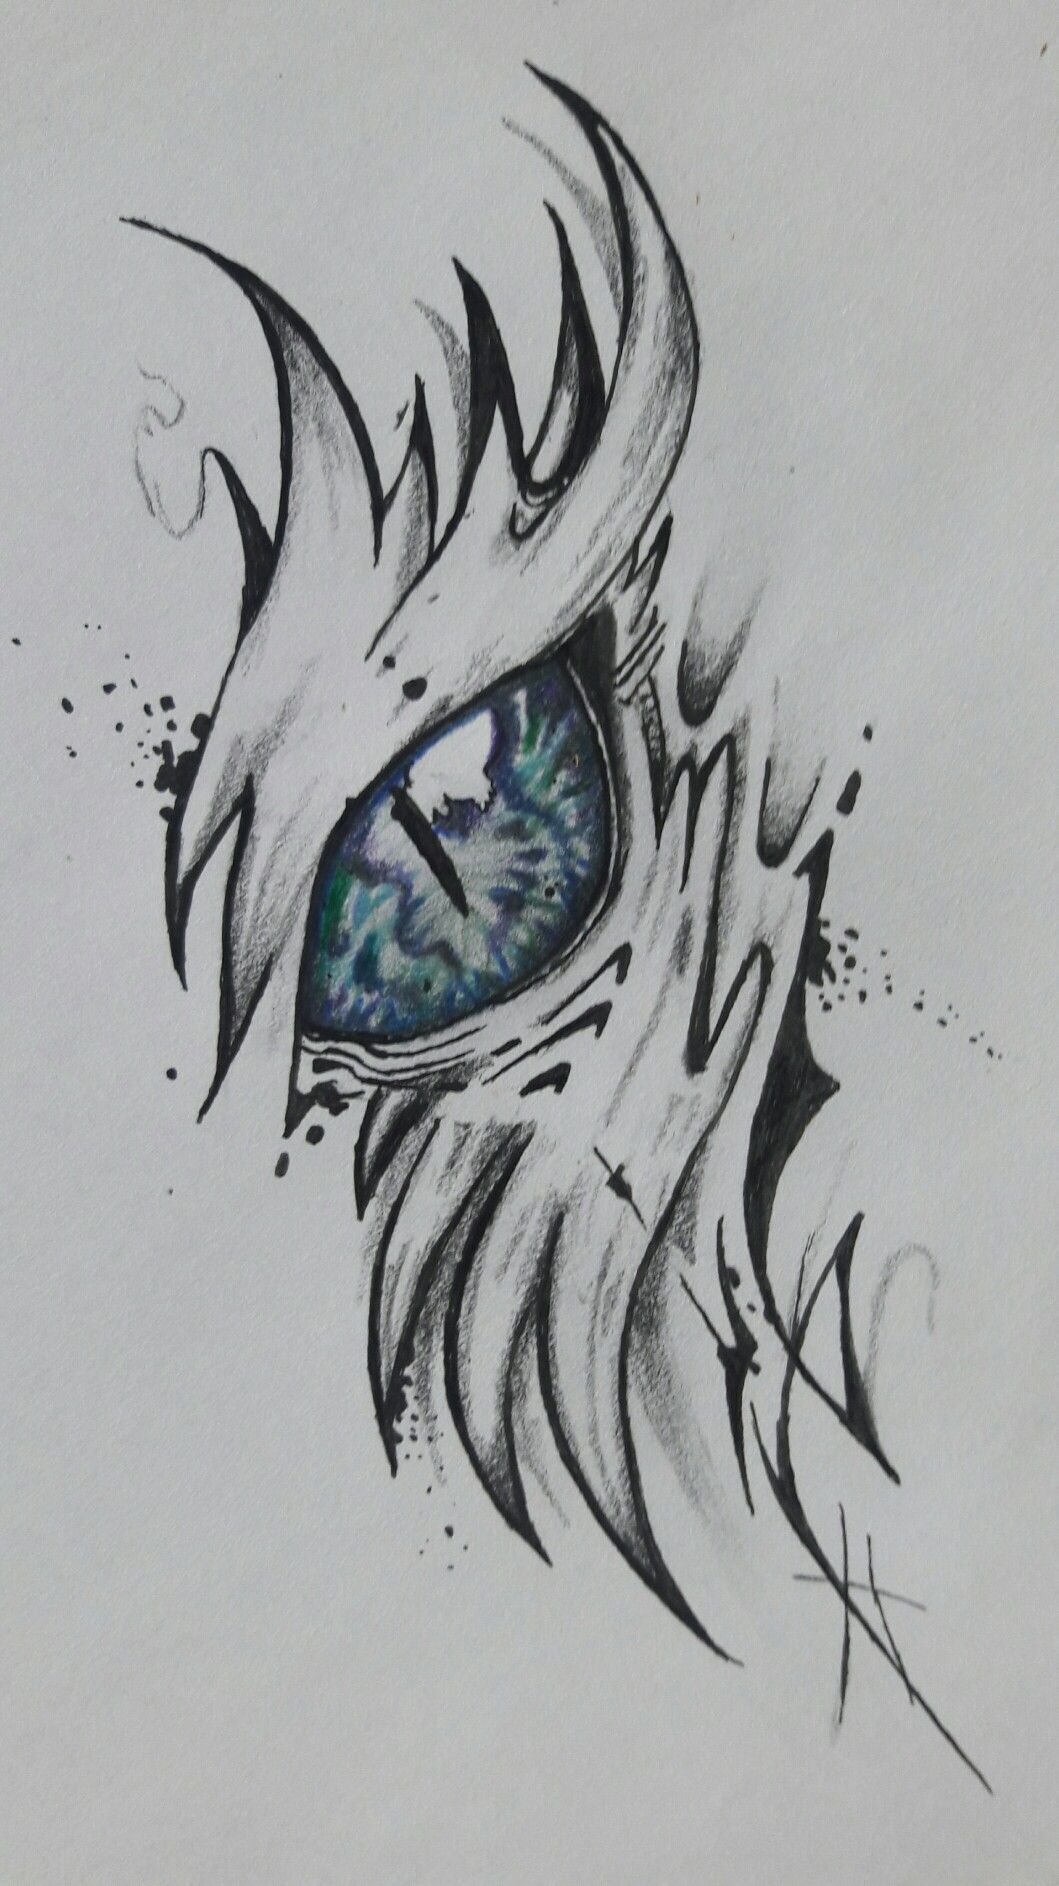 Qued Lindo 3 Tattoo Idea In 2019 Drawings Dragon Eye Drawing Art